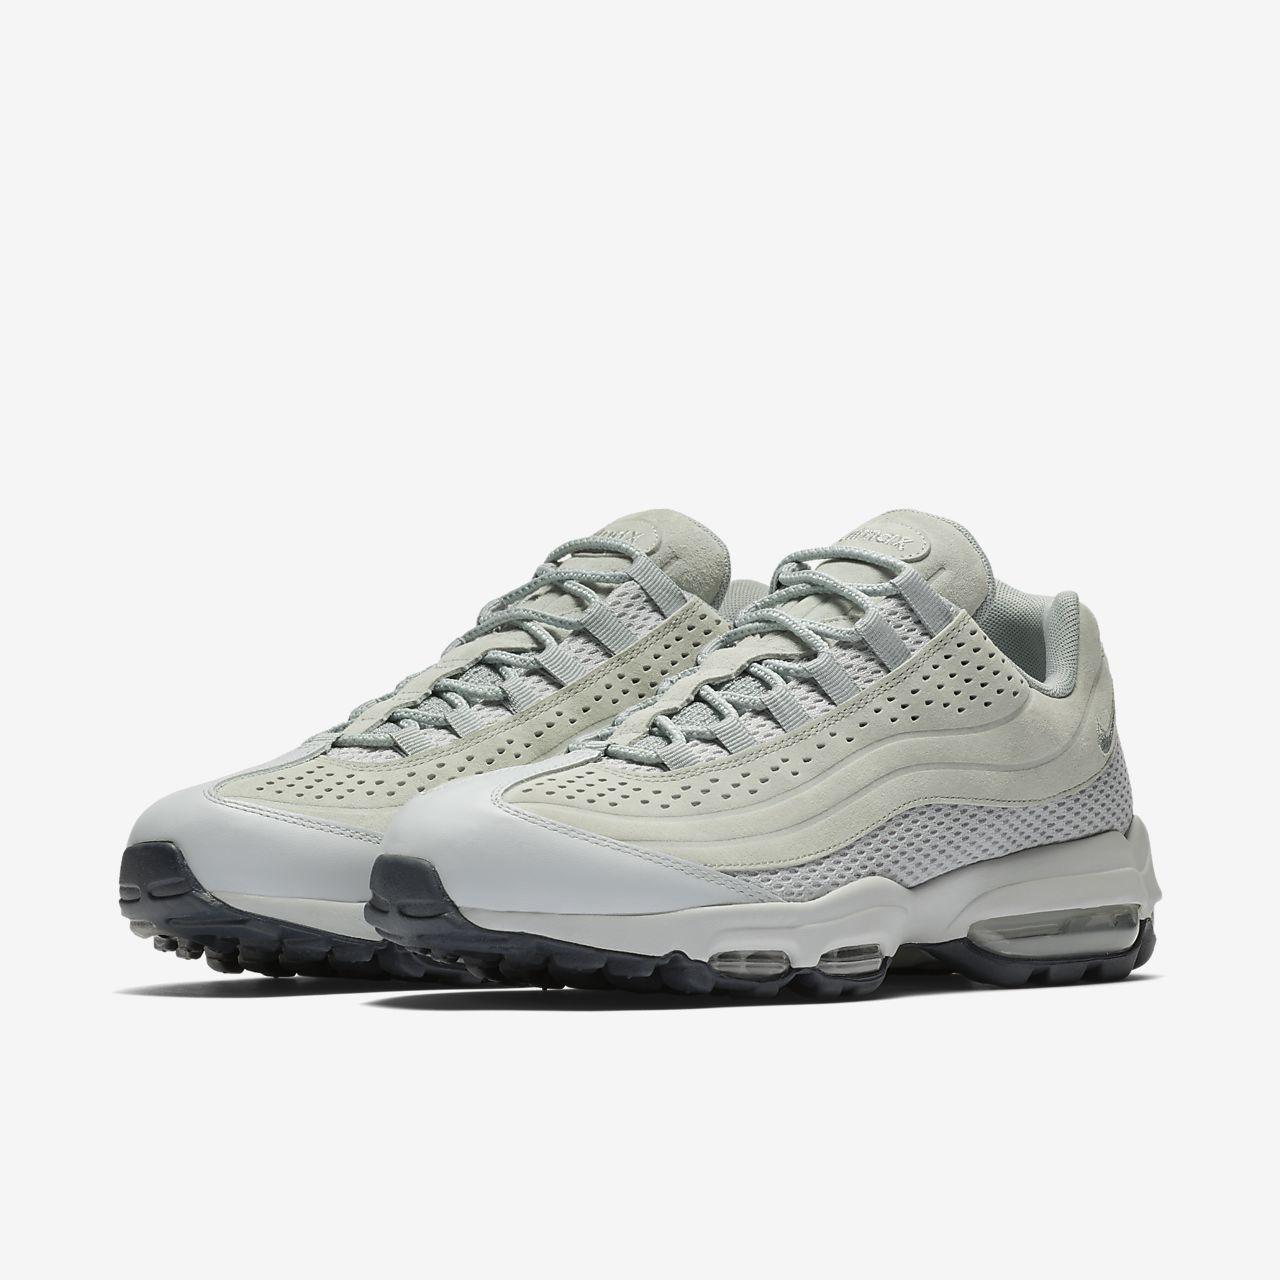 53da17259f77a3 Brandneue Unisex Günstig Online NIKE AIR MAX 95 PREMIUM Low Sneakers    Tennisschuhe Damen Billig 100